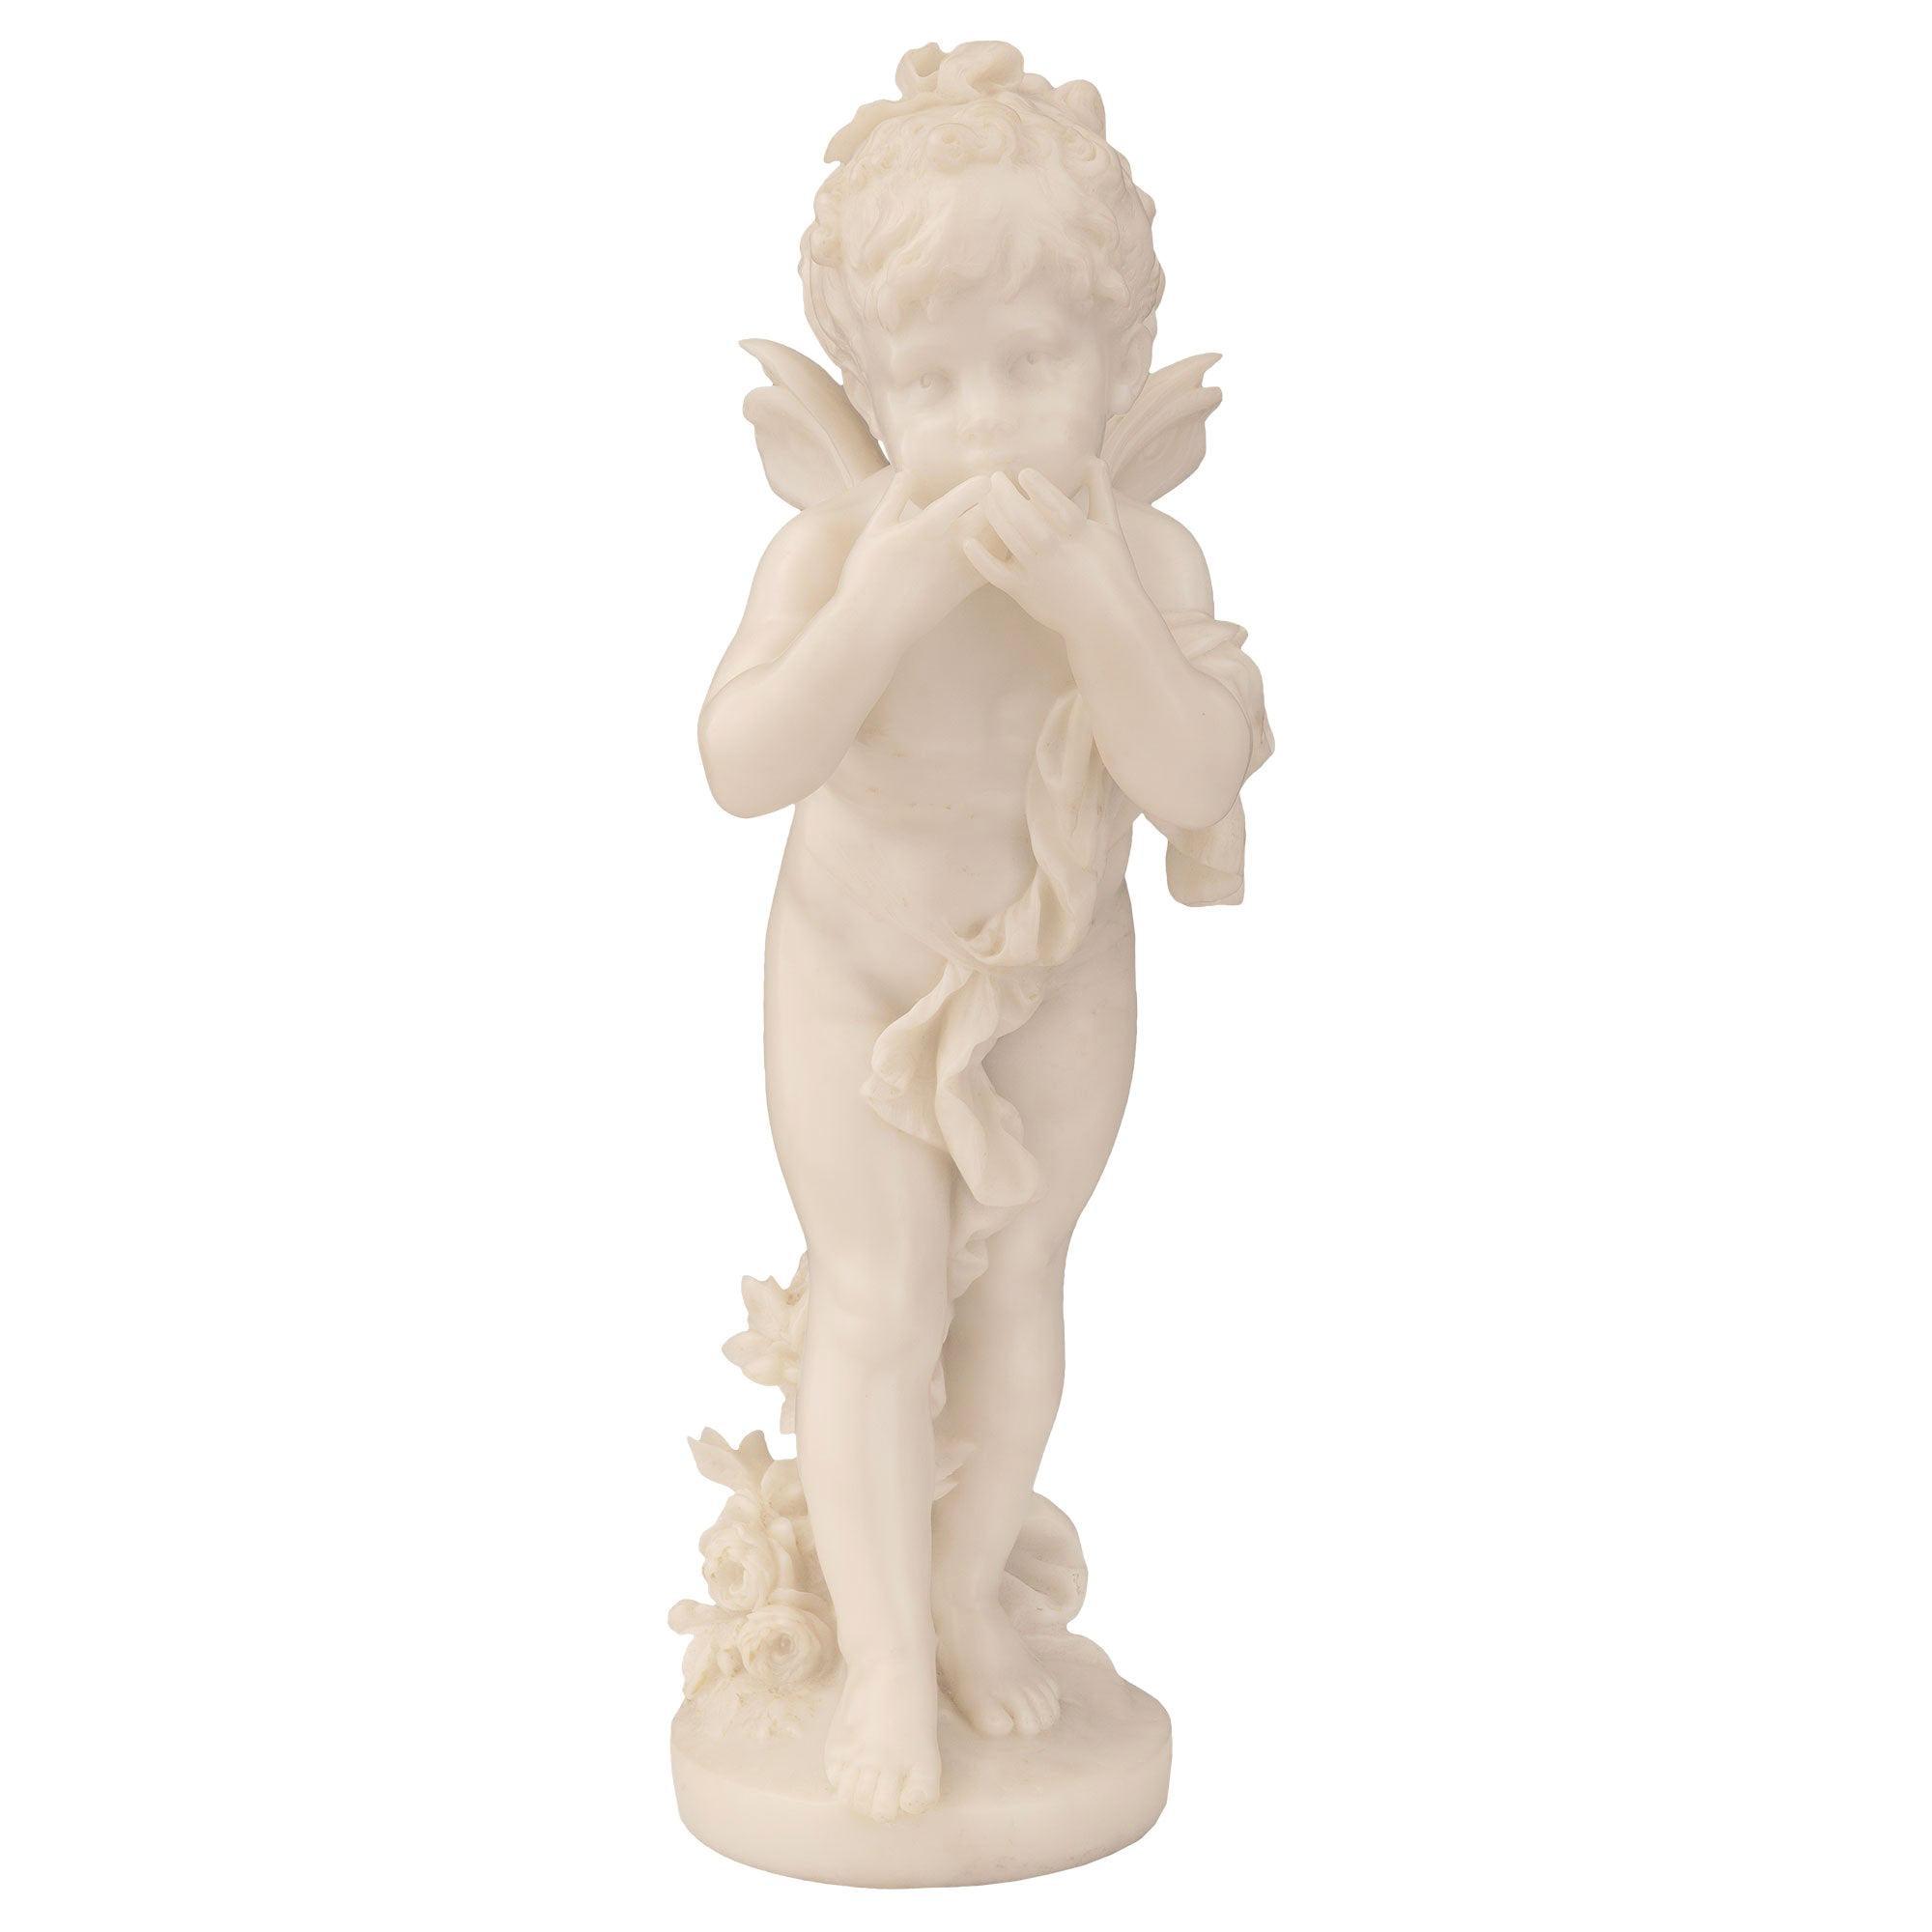 Italian Mid-19th Century White Carrara Marble Statue of Winged Girl